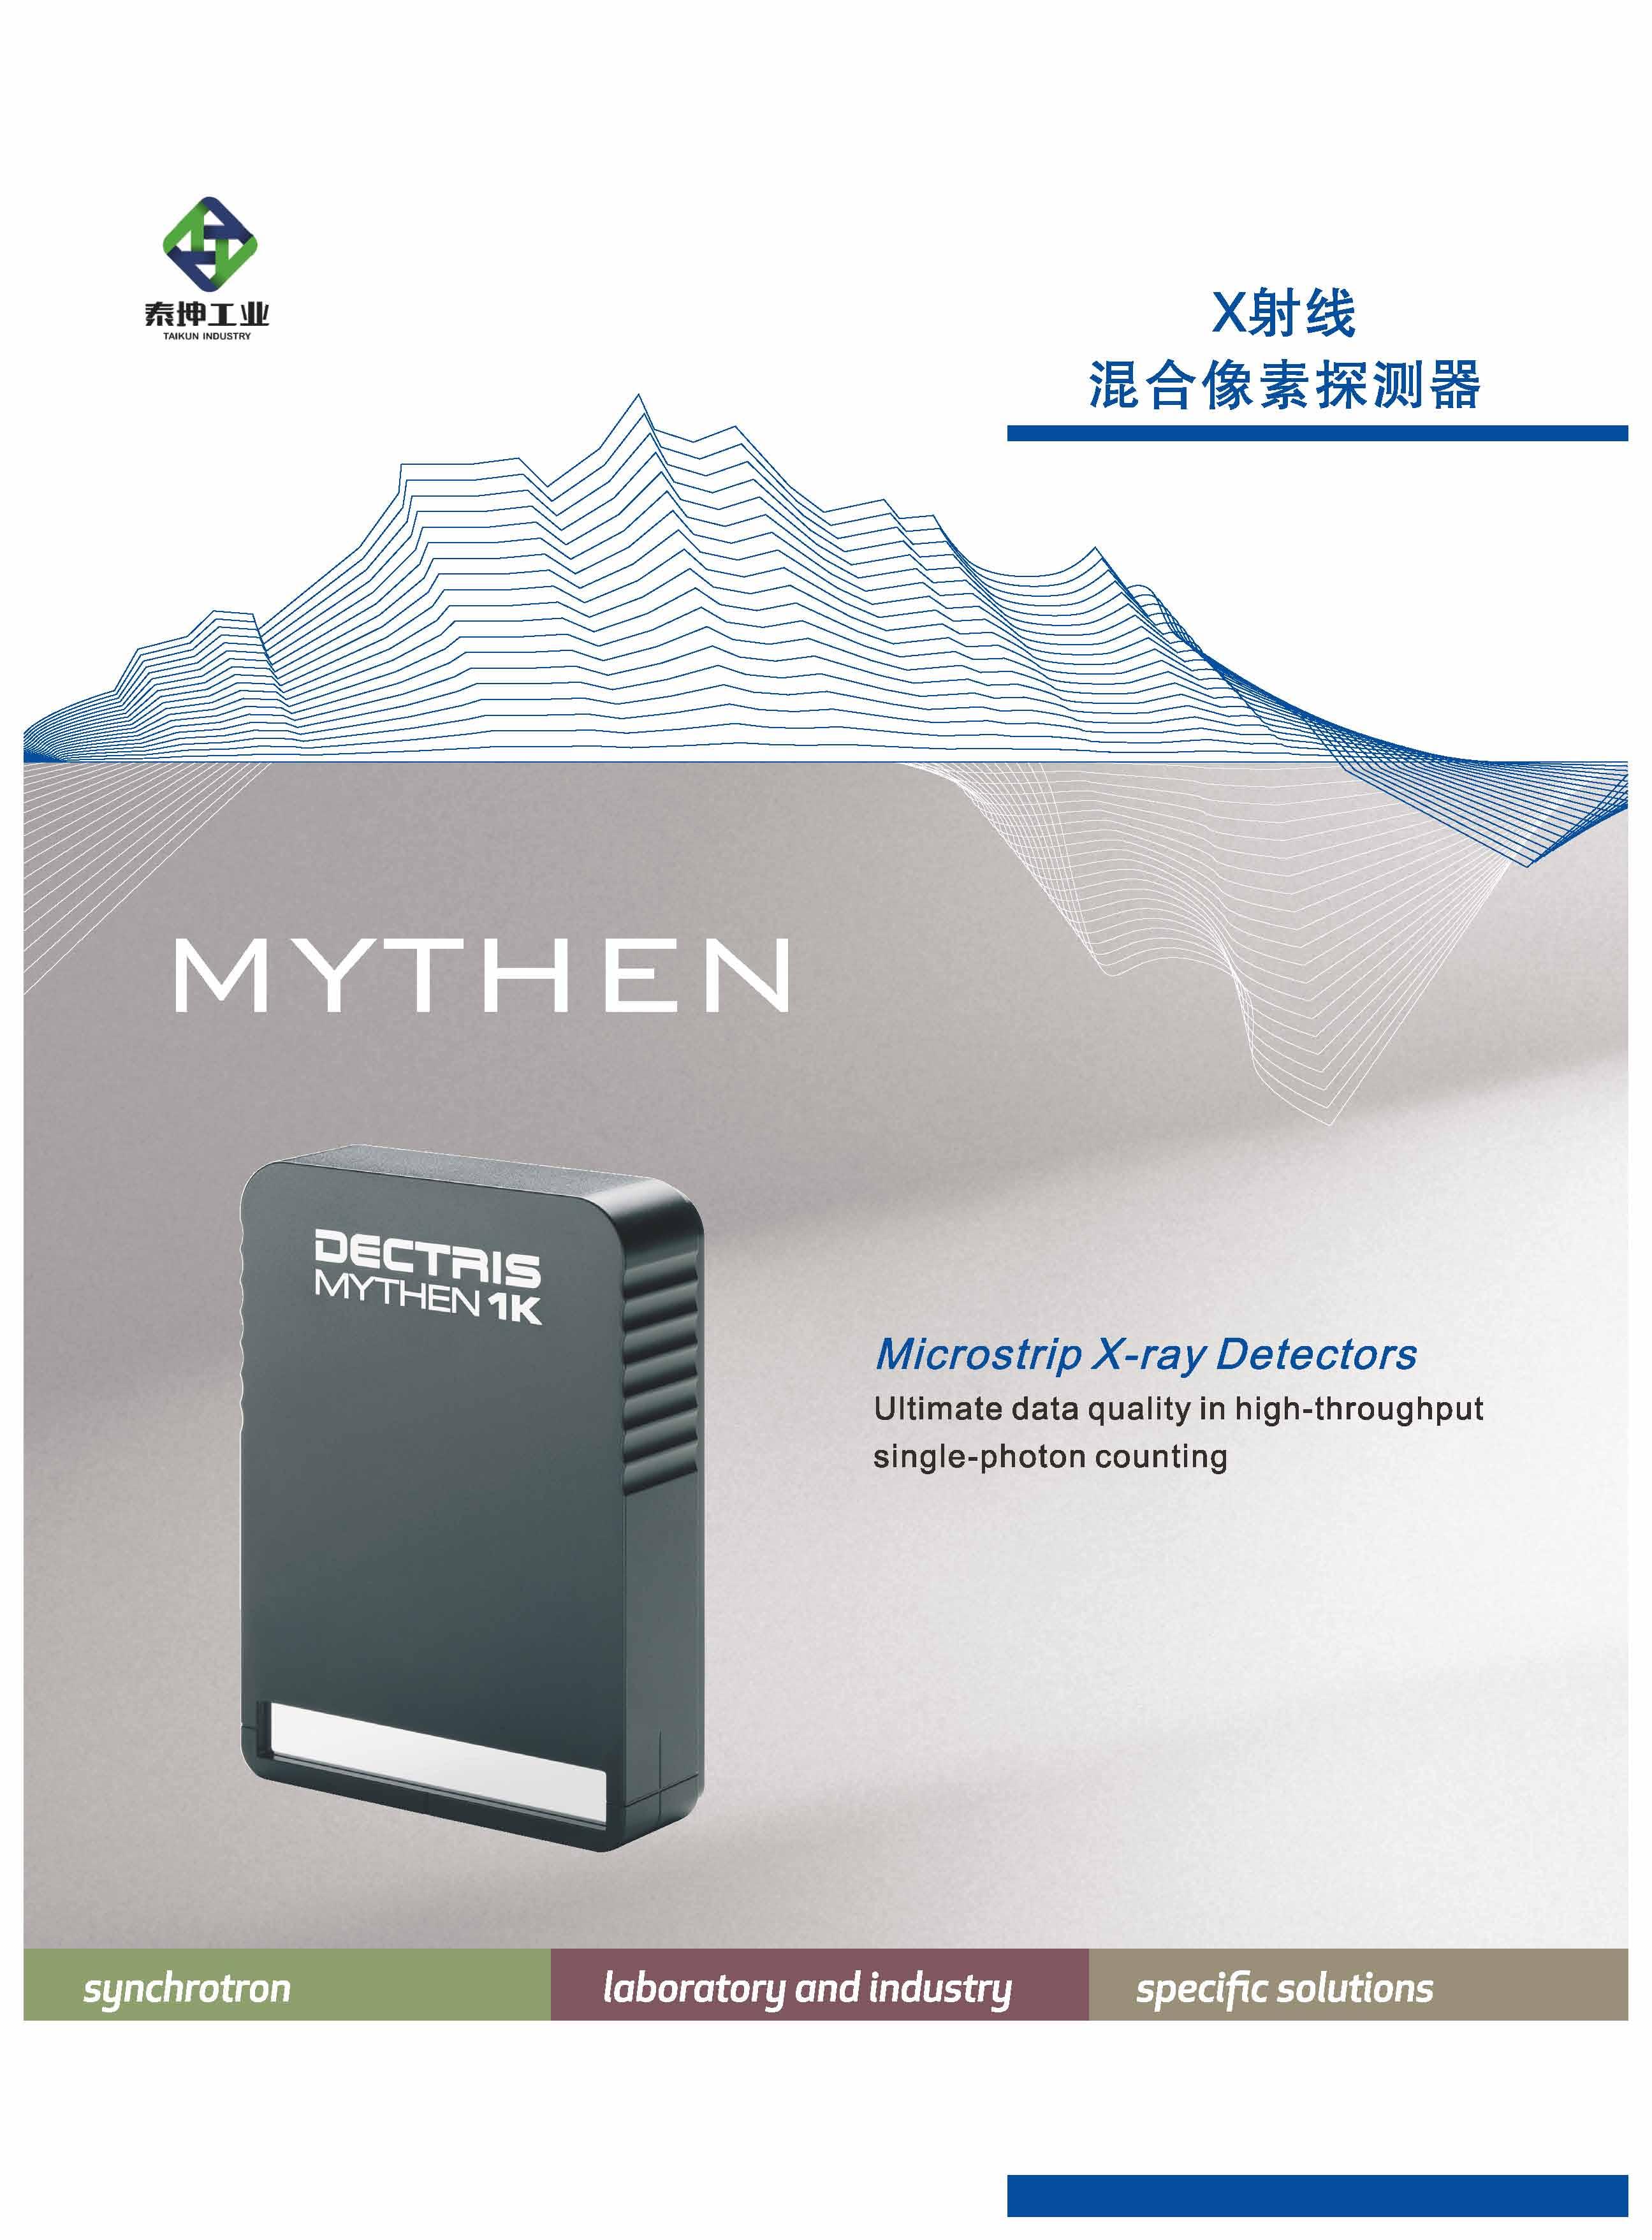 MYTHEN2 R 线阵混合像素光子计数X射线探测器